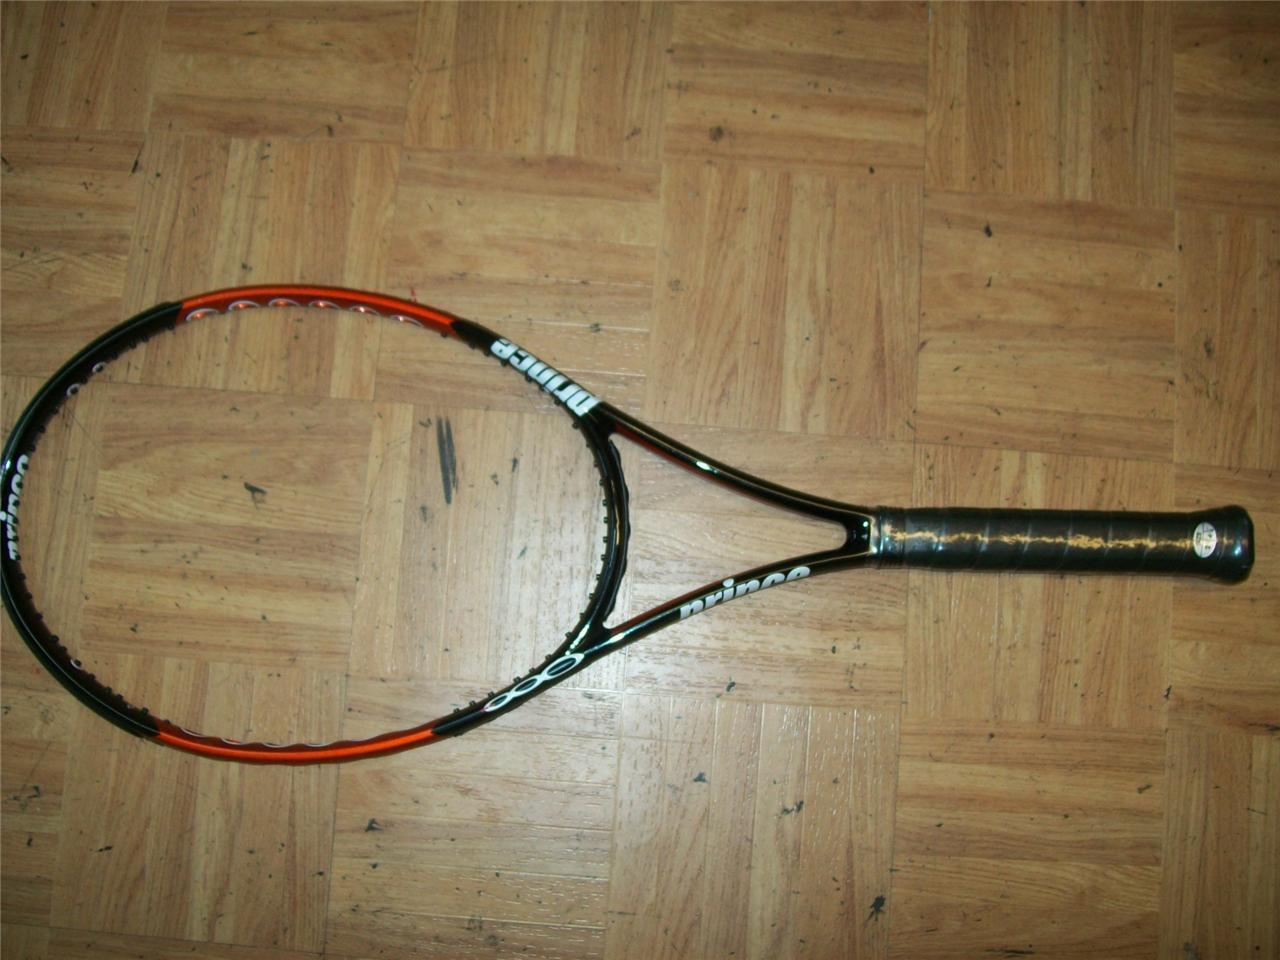 NEW Prince O3 Hybrid Tour 16x18 95 head 4 5 8 grip Tennis Racquet